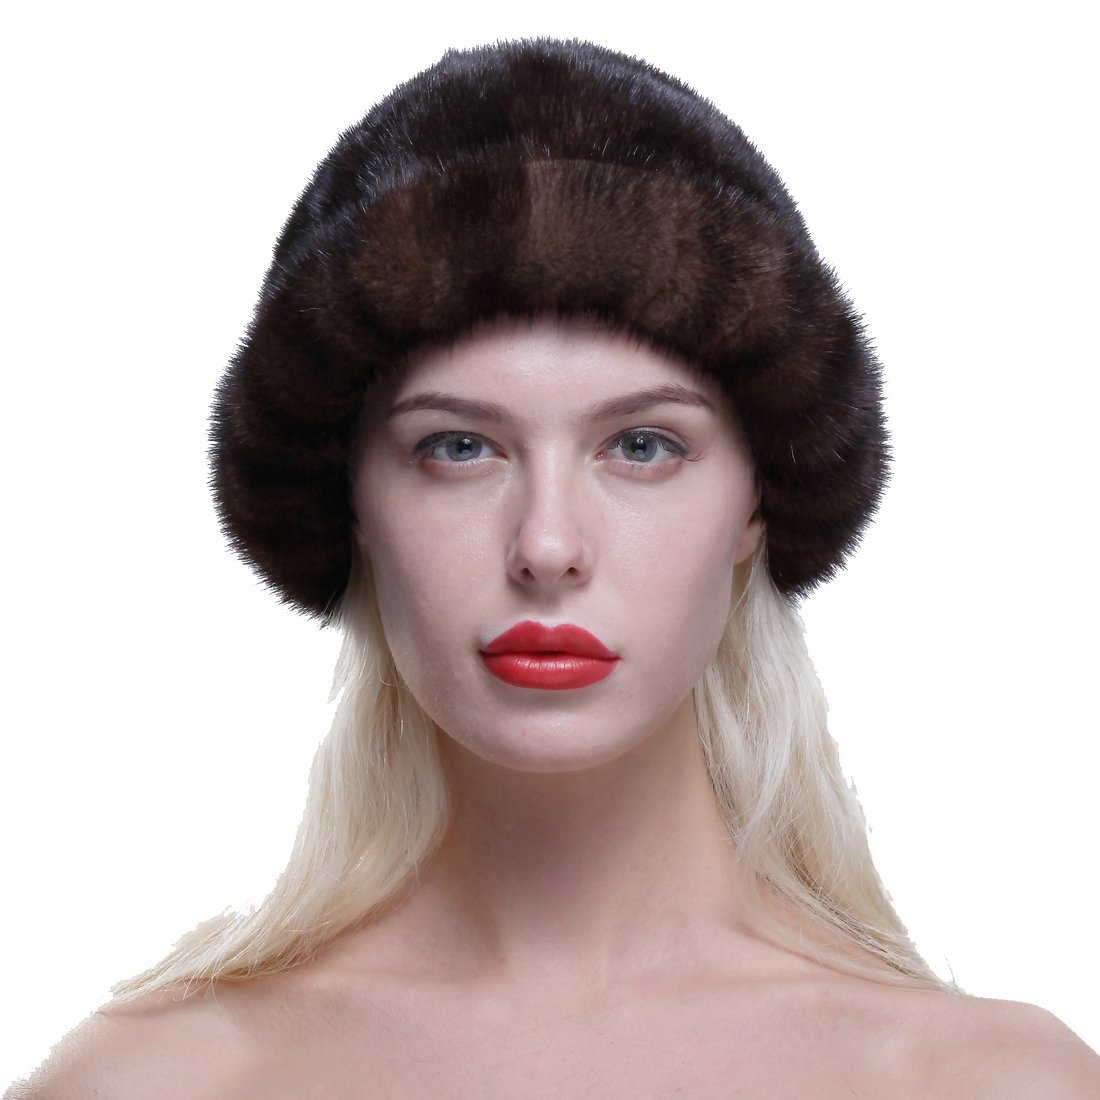 URSFUR Women's Genuine Mink Fur Roller Hat Cap with Mink Top Coffee by URSFUR